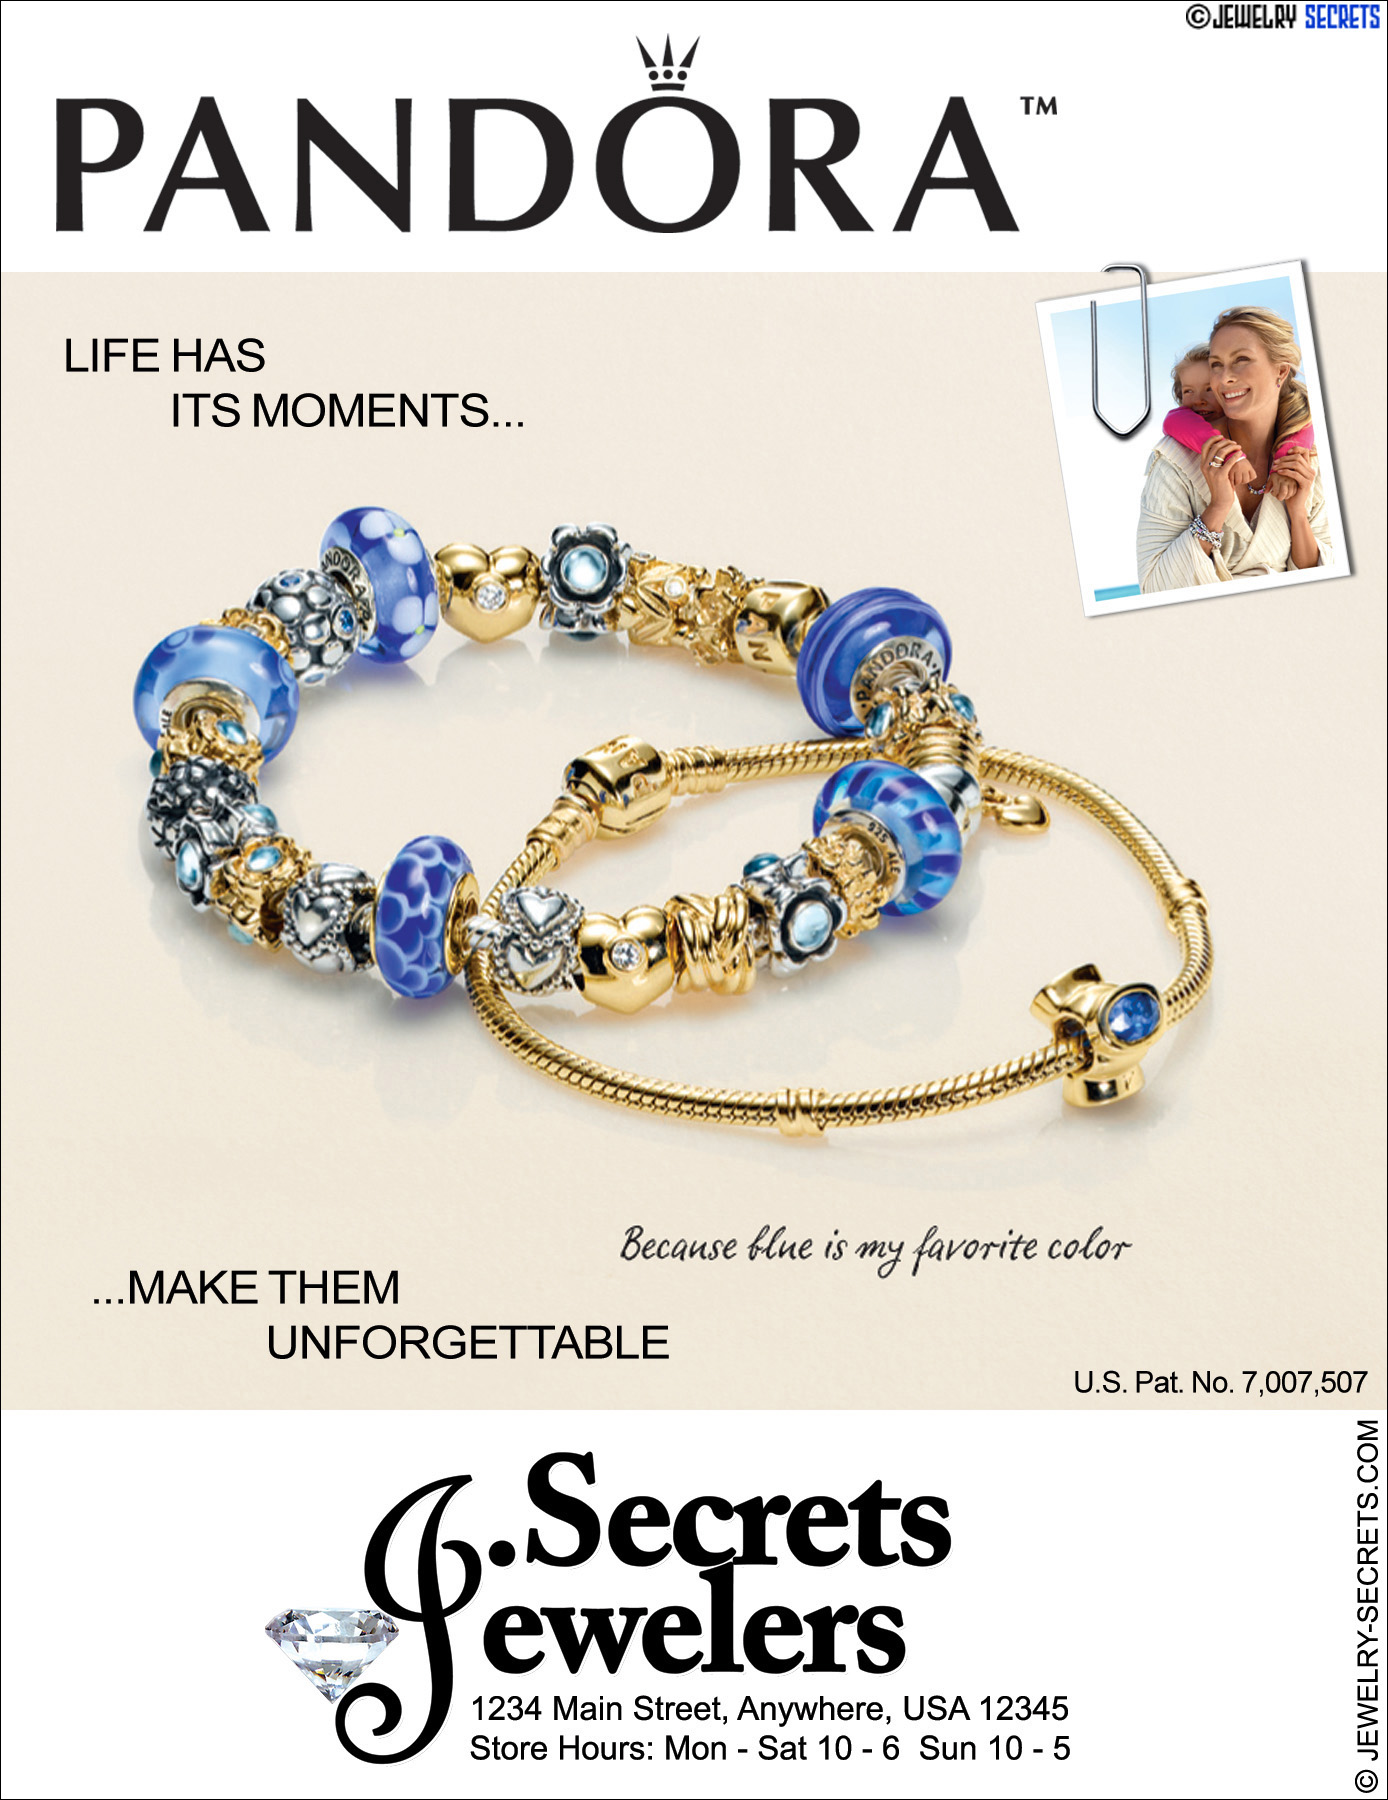 Pandora Bracelet Sample Advertisement Jewelry Secrets